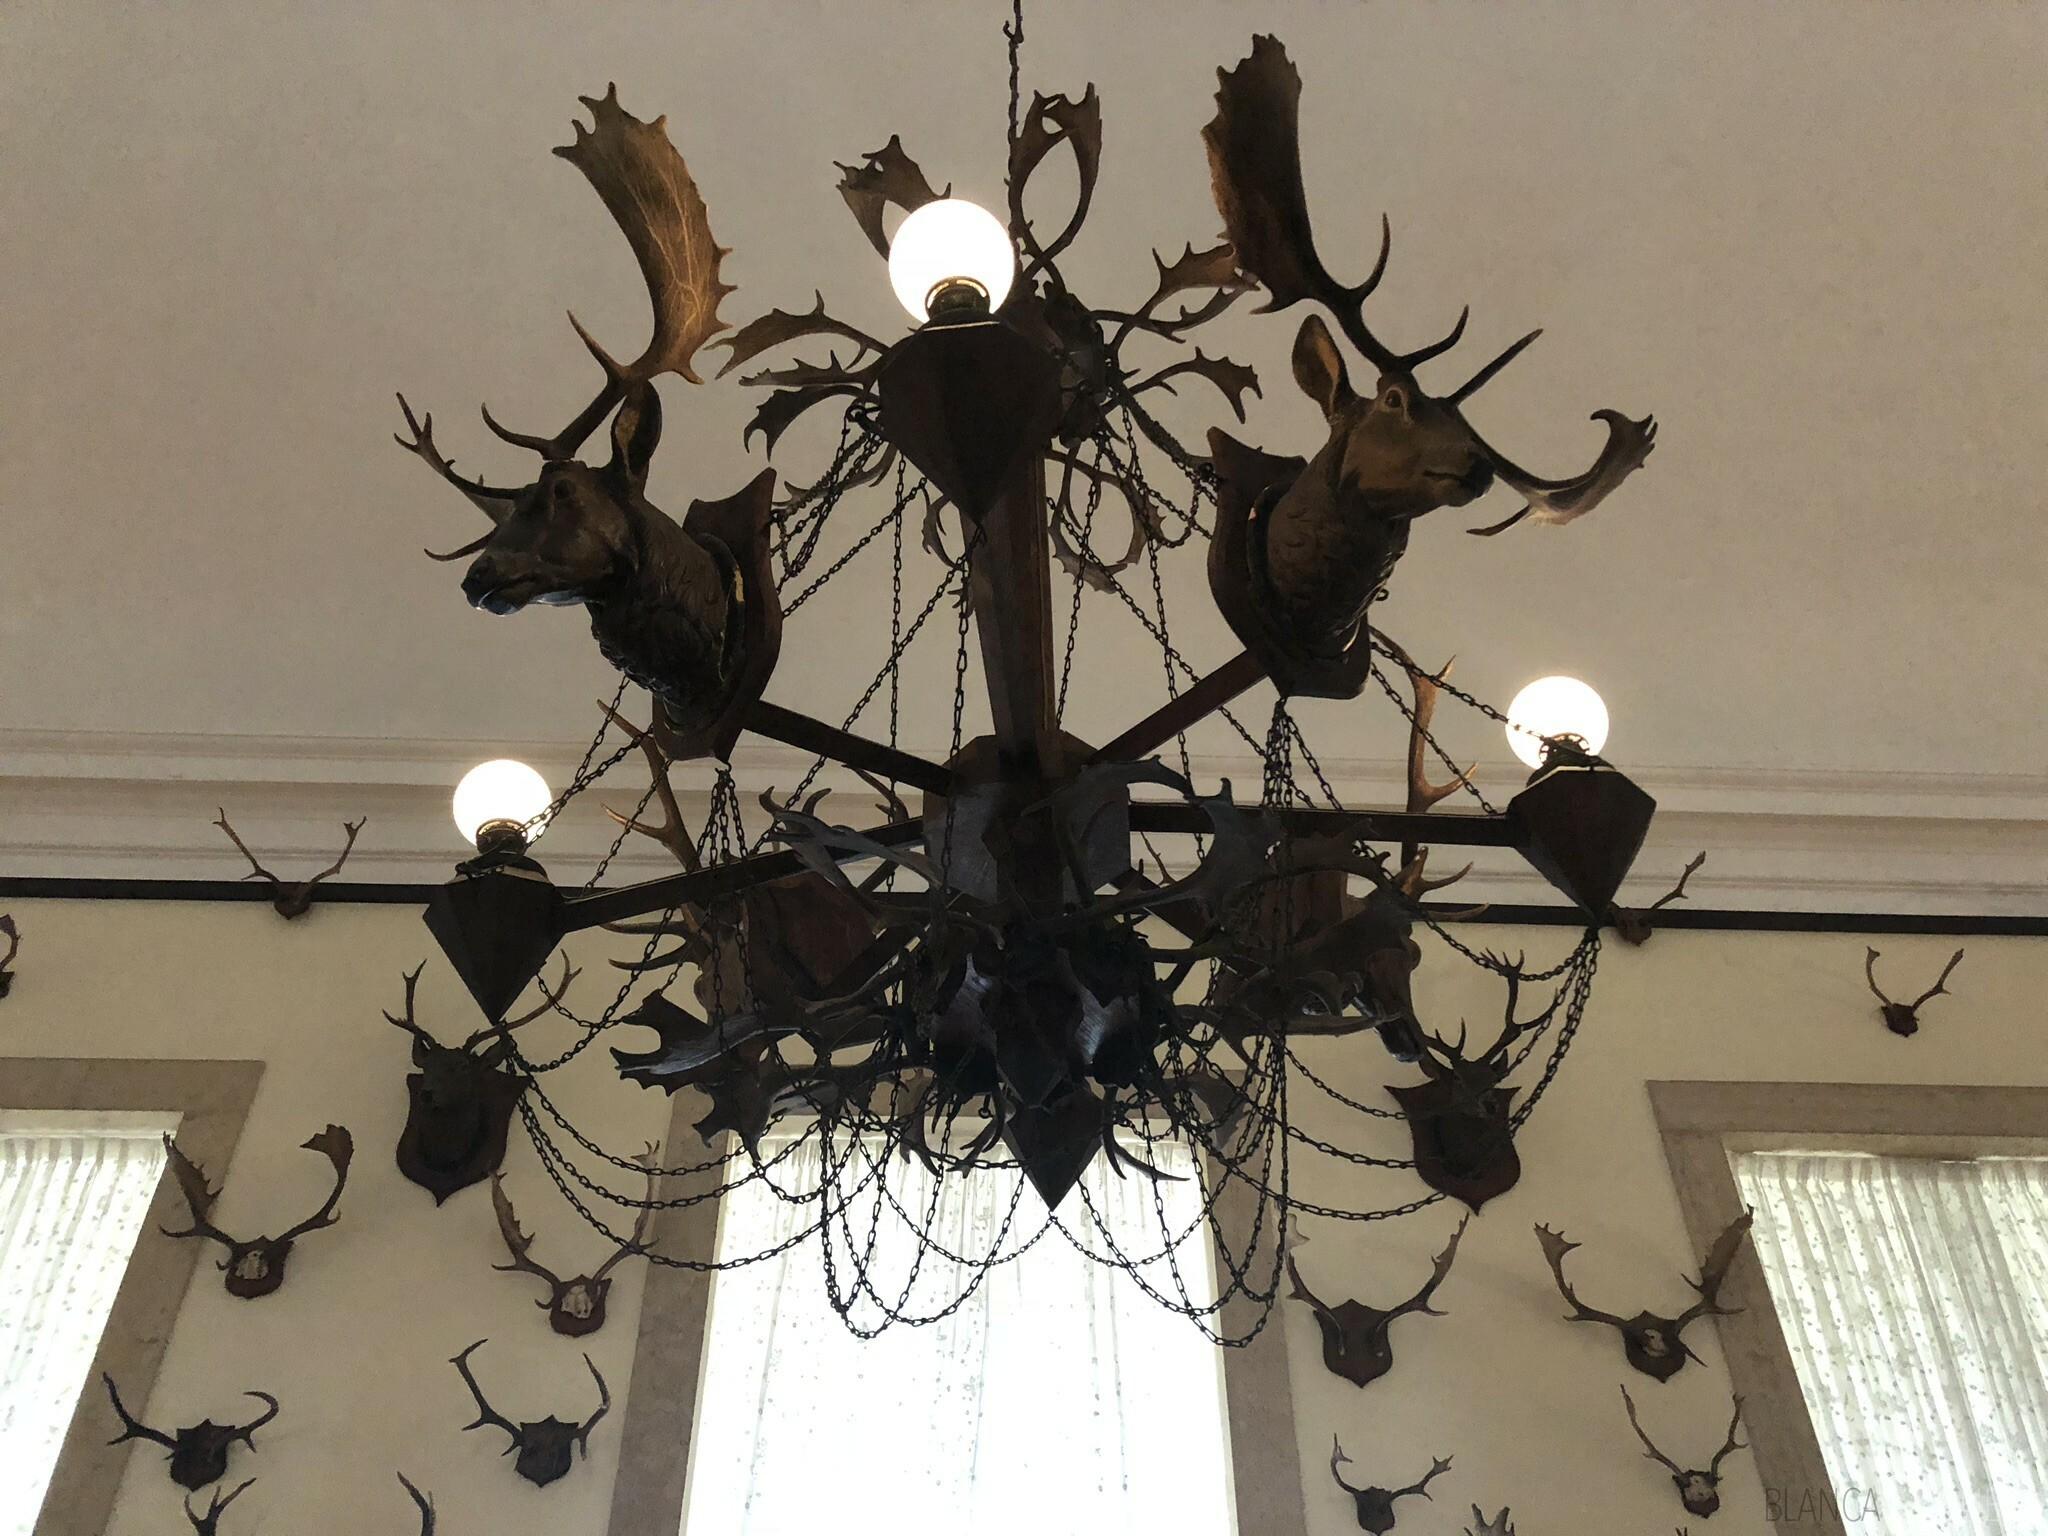 Palacio de Mafra's hunting trophy history